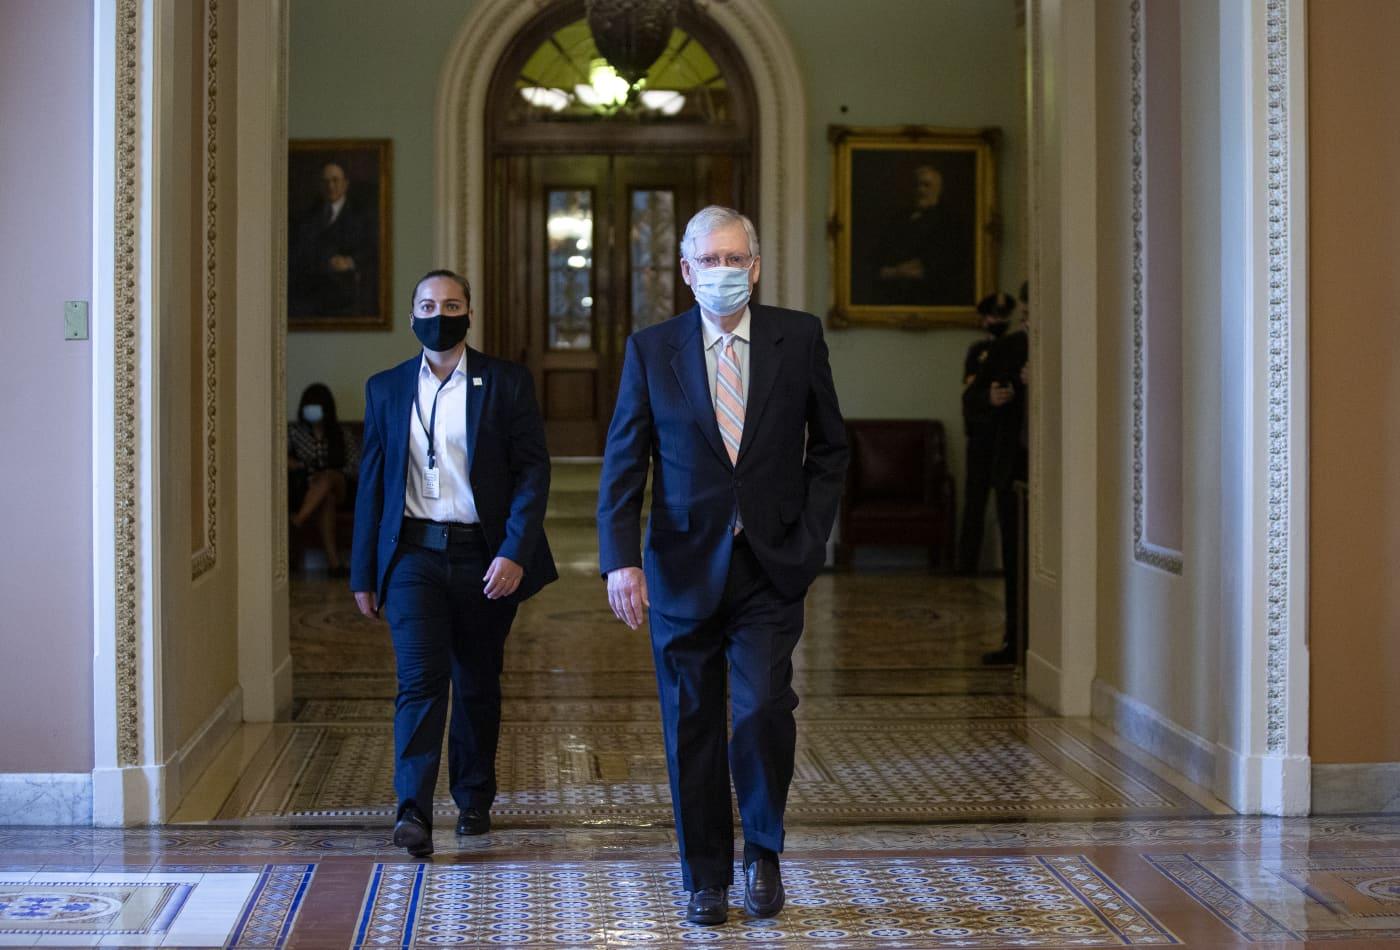 Senate adjourns until September with no coronavirus relief bill